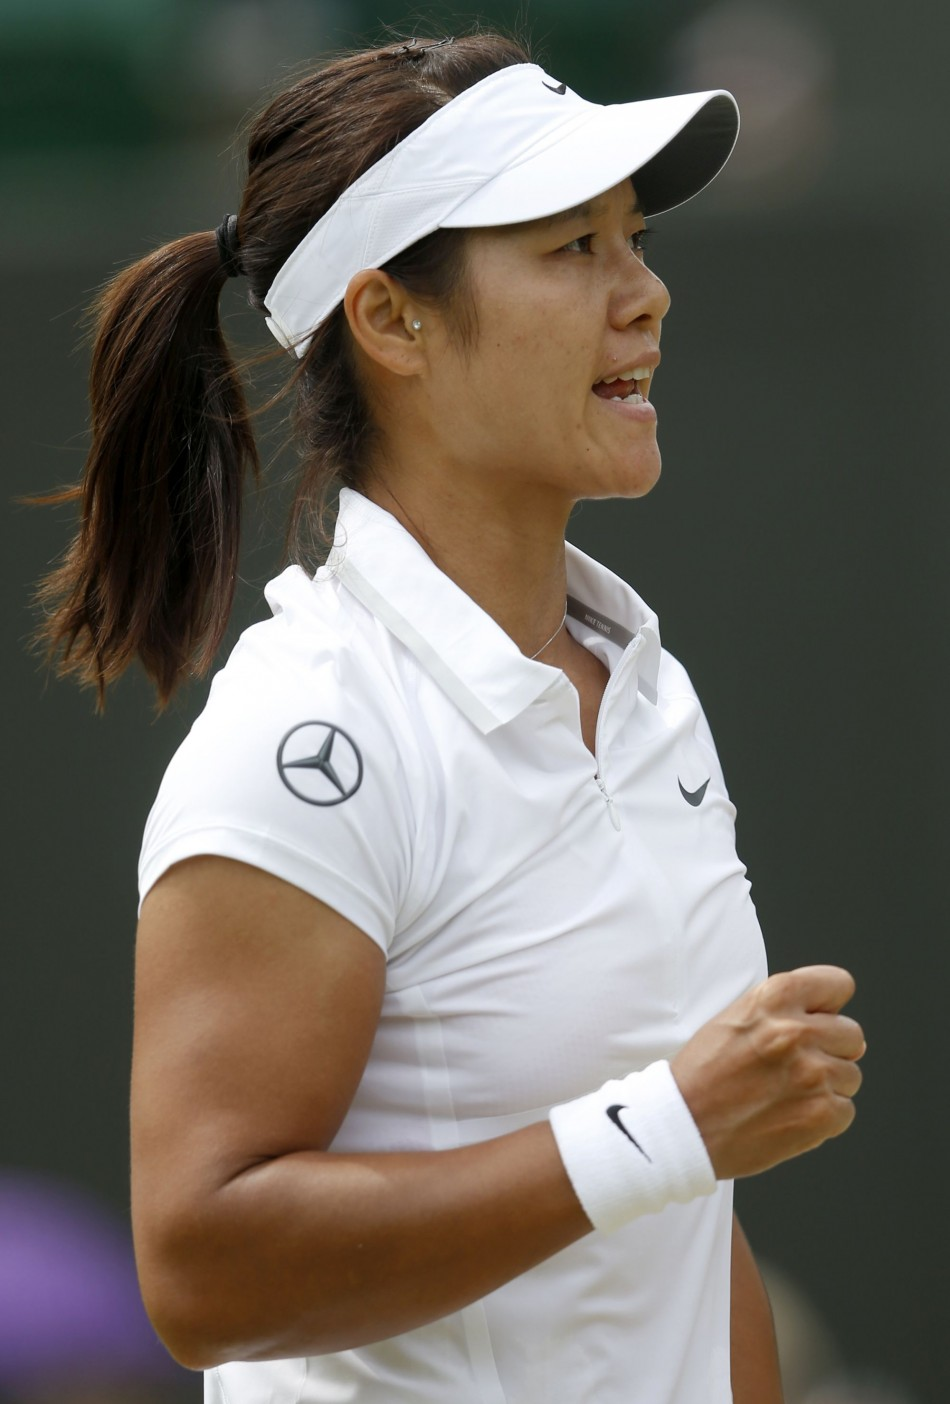 3. Li Na, Tennis